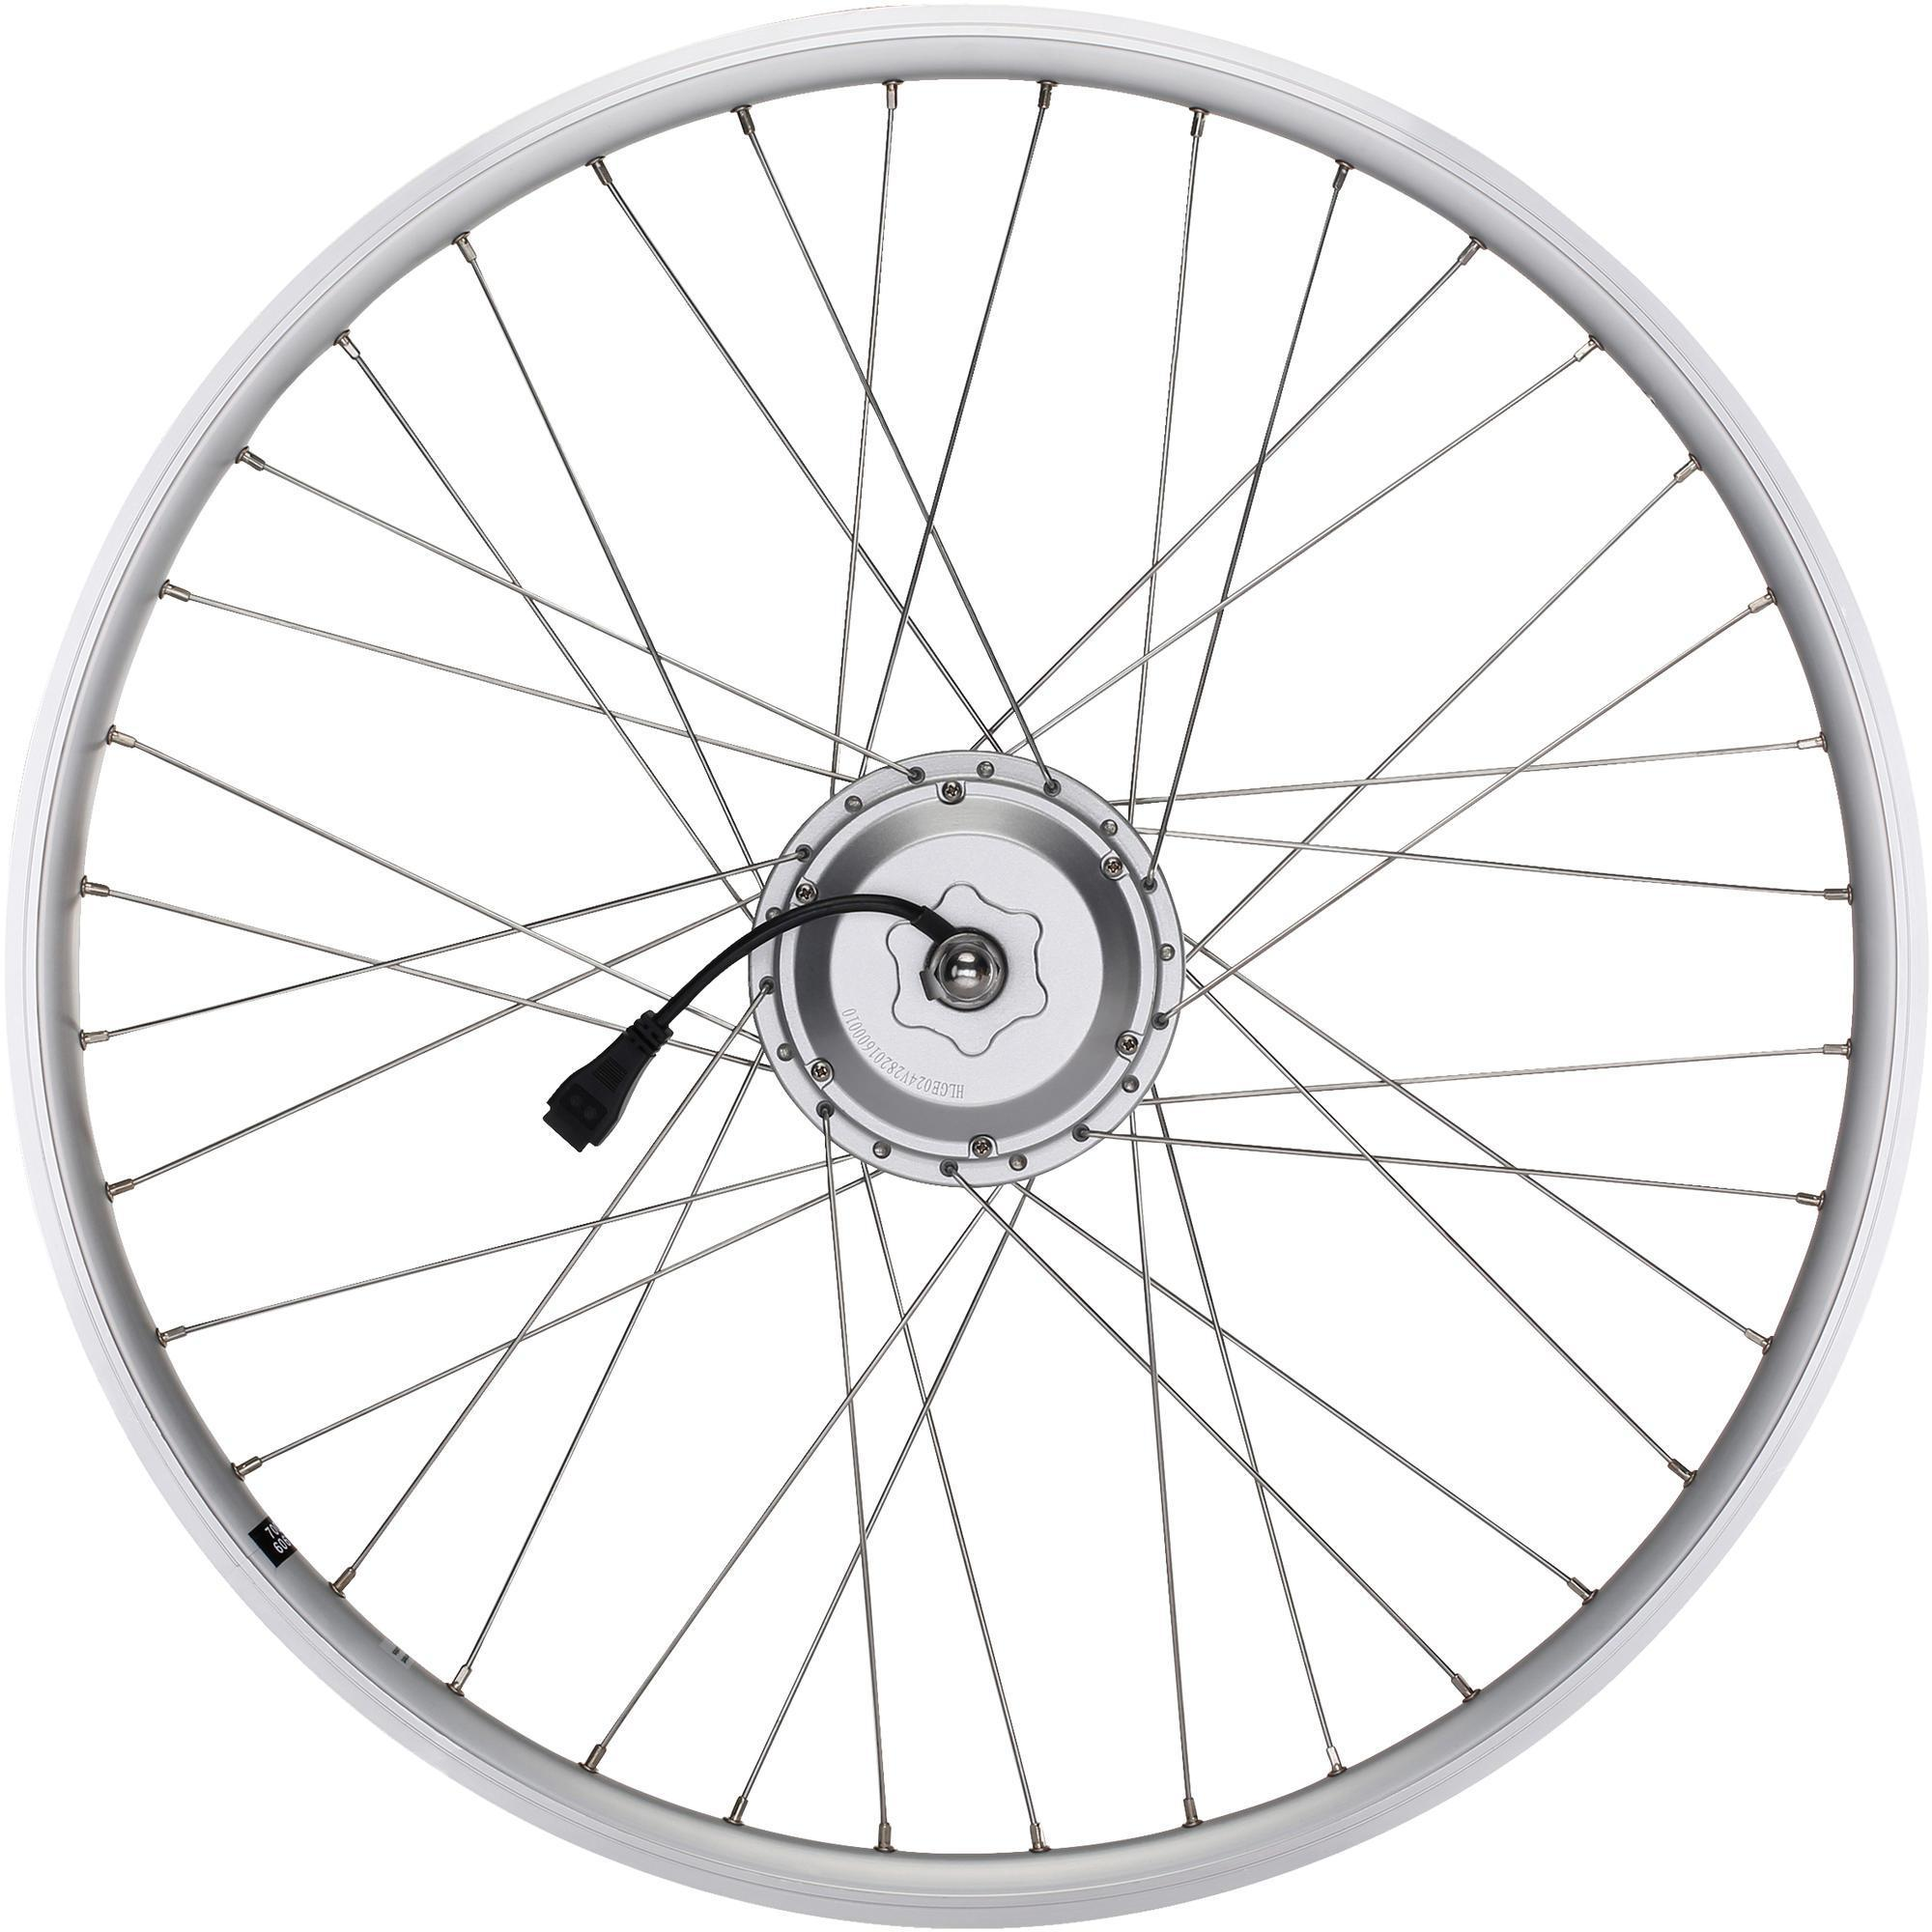 B'twin Achterwiel voor elektrische fiets 28 inch B'Ebike 7